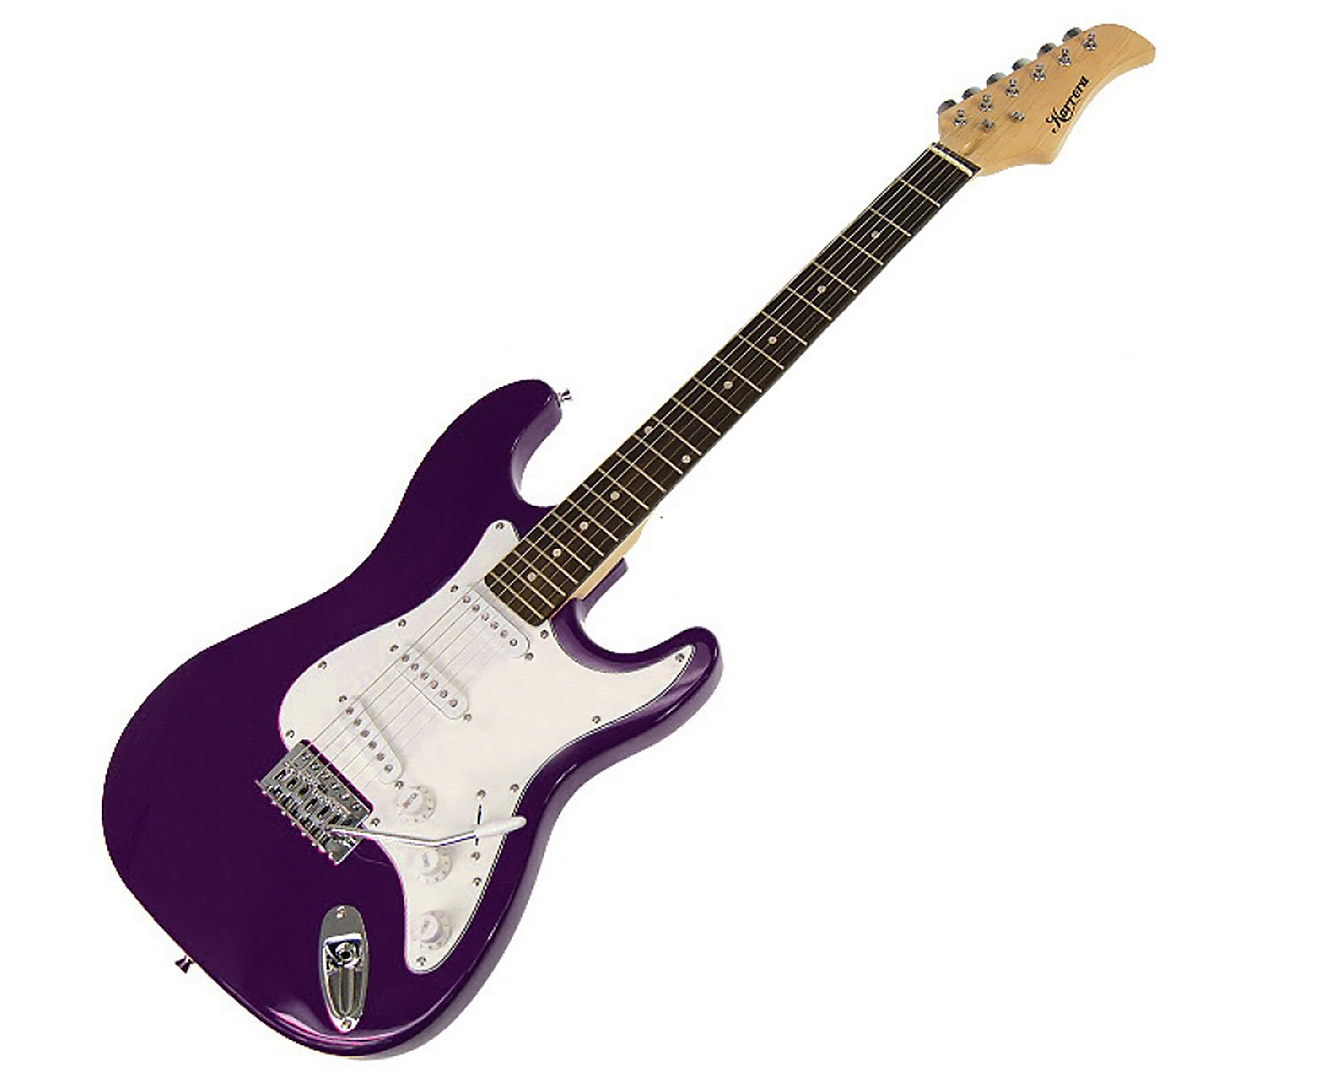 Karrera 39in Electric Guitar - Purple